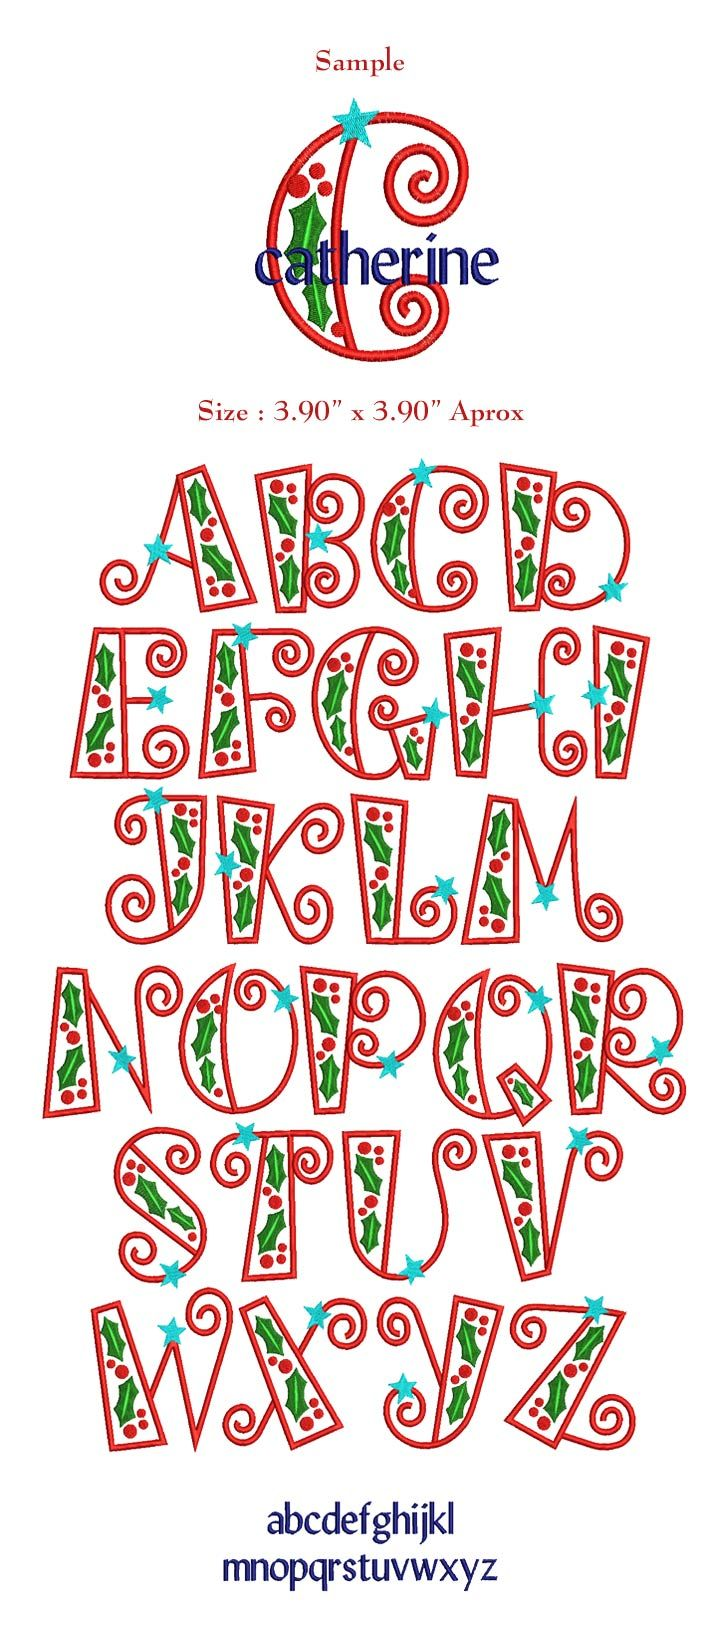 17 best ideas about christmas fonts on pinterest free - Alphabet noel ...